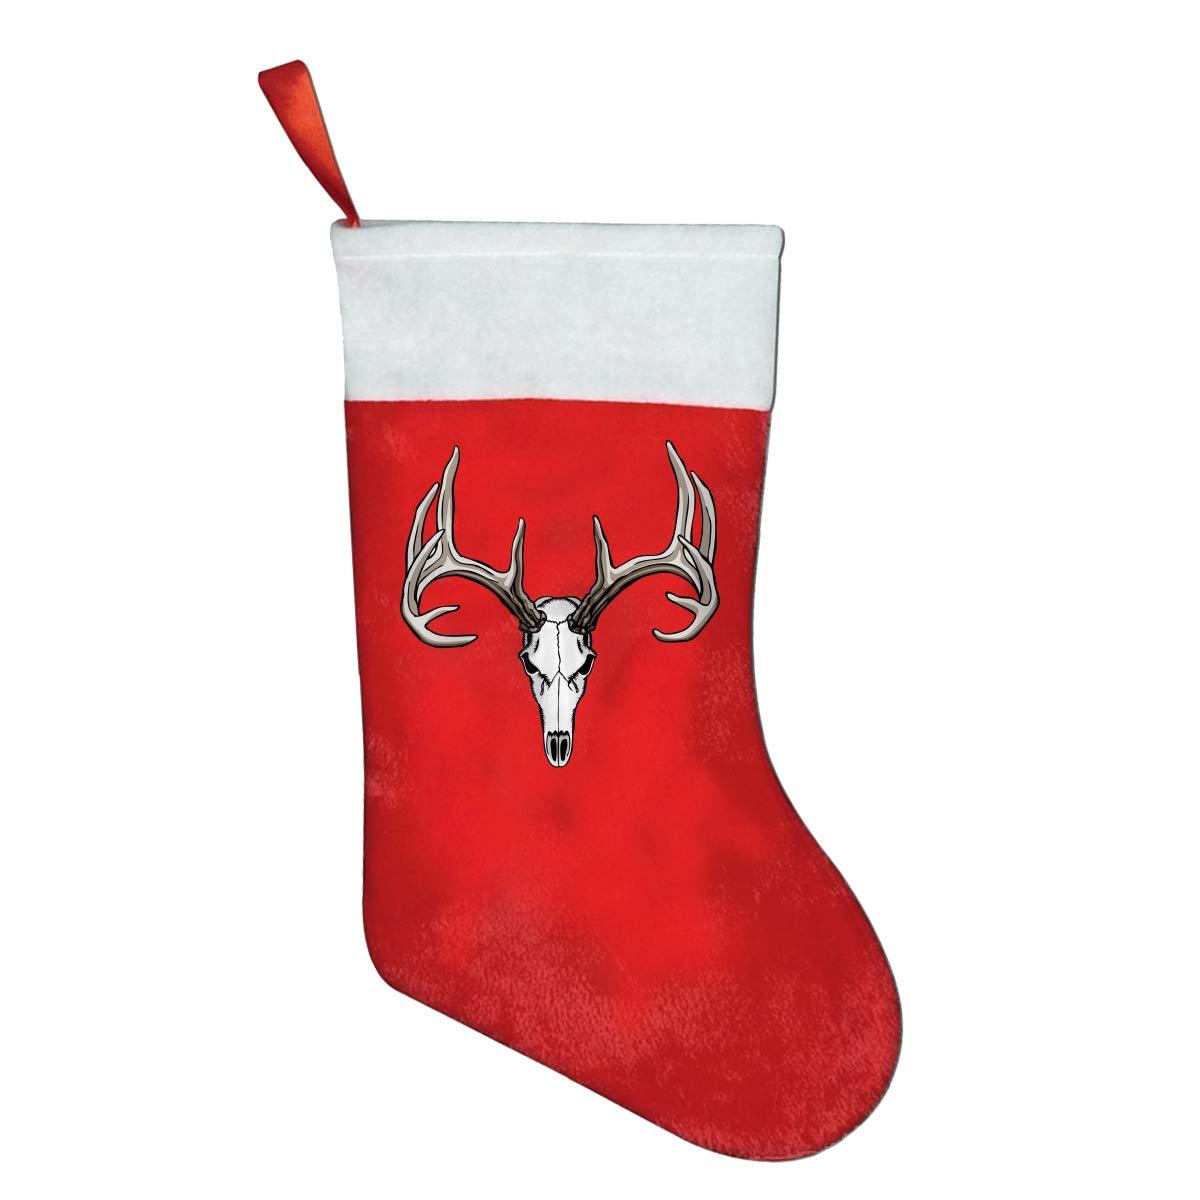 Amazon com: Deer Skull Red Felt Classic Christmas Stockings